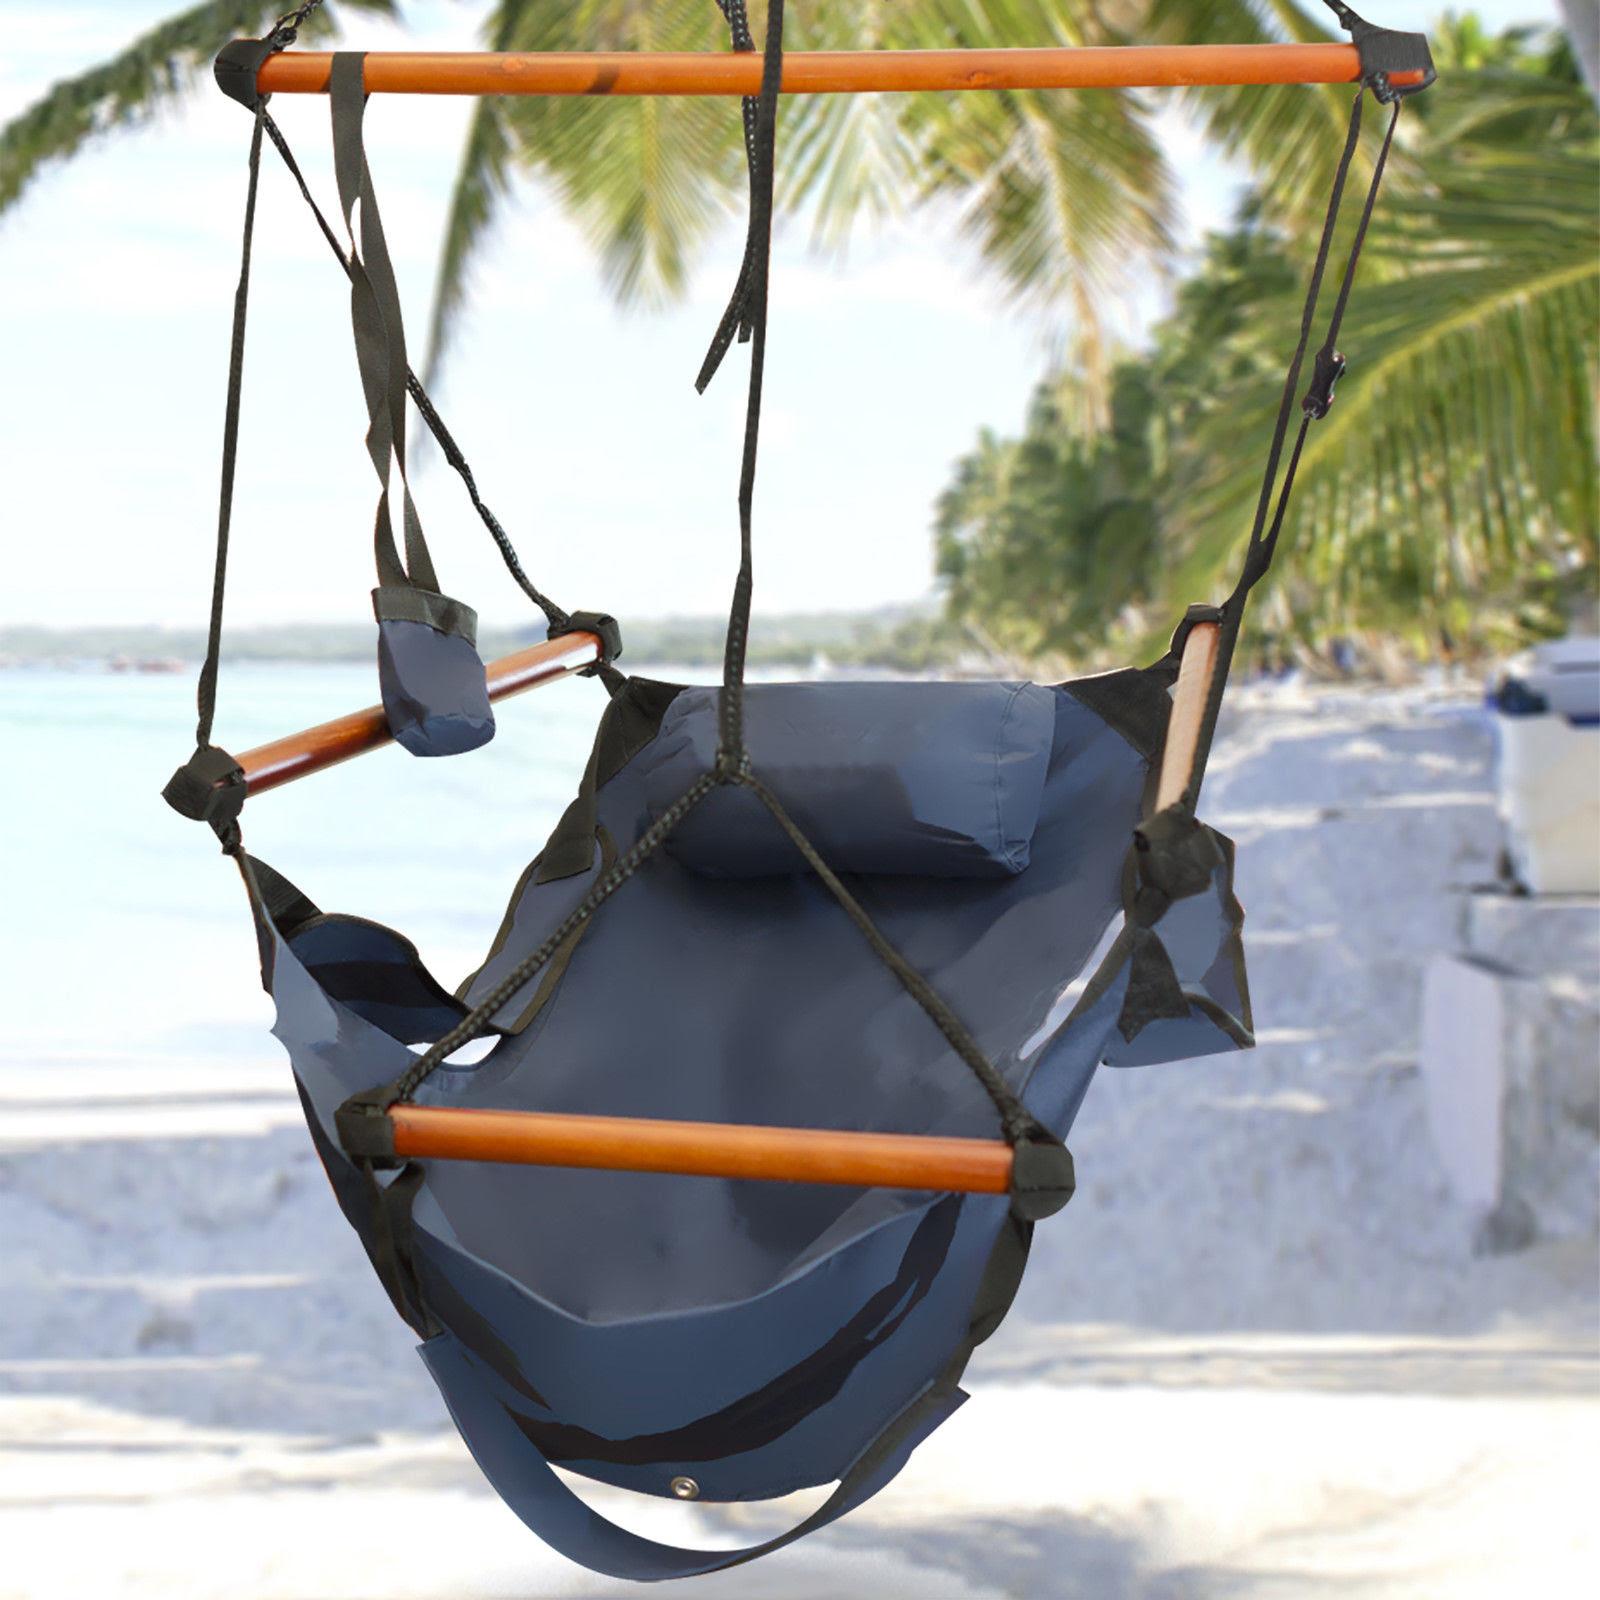 New Deluxe Hammock Hanging Patio Tree Sky Swing Chair ...